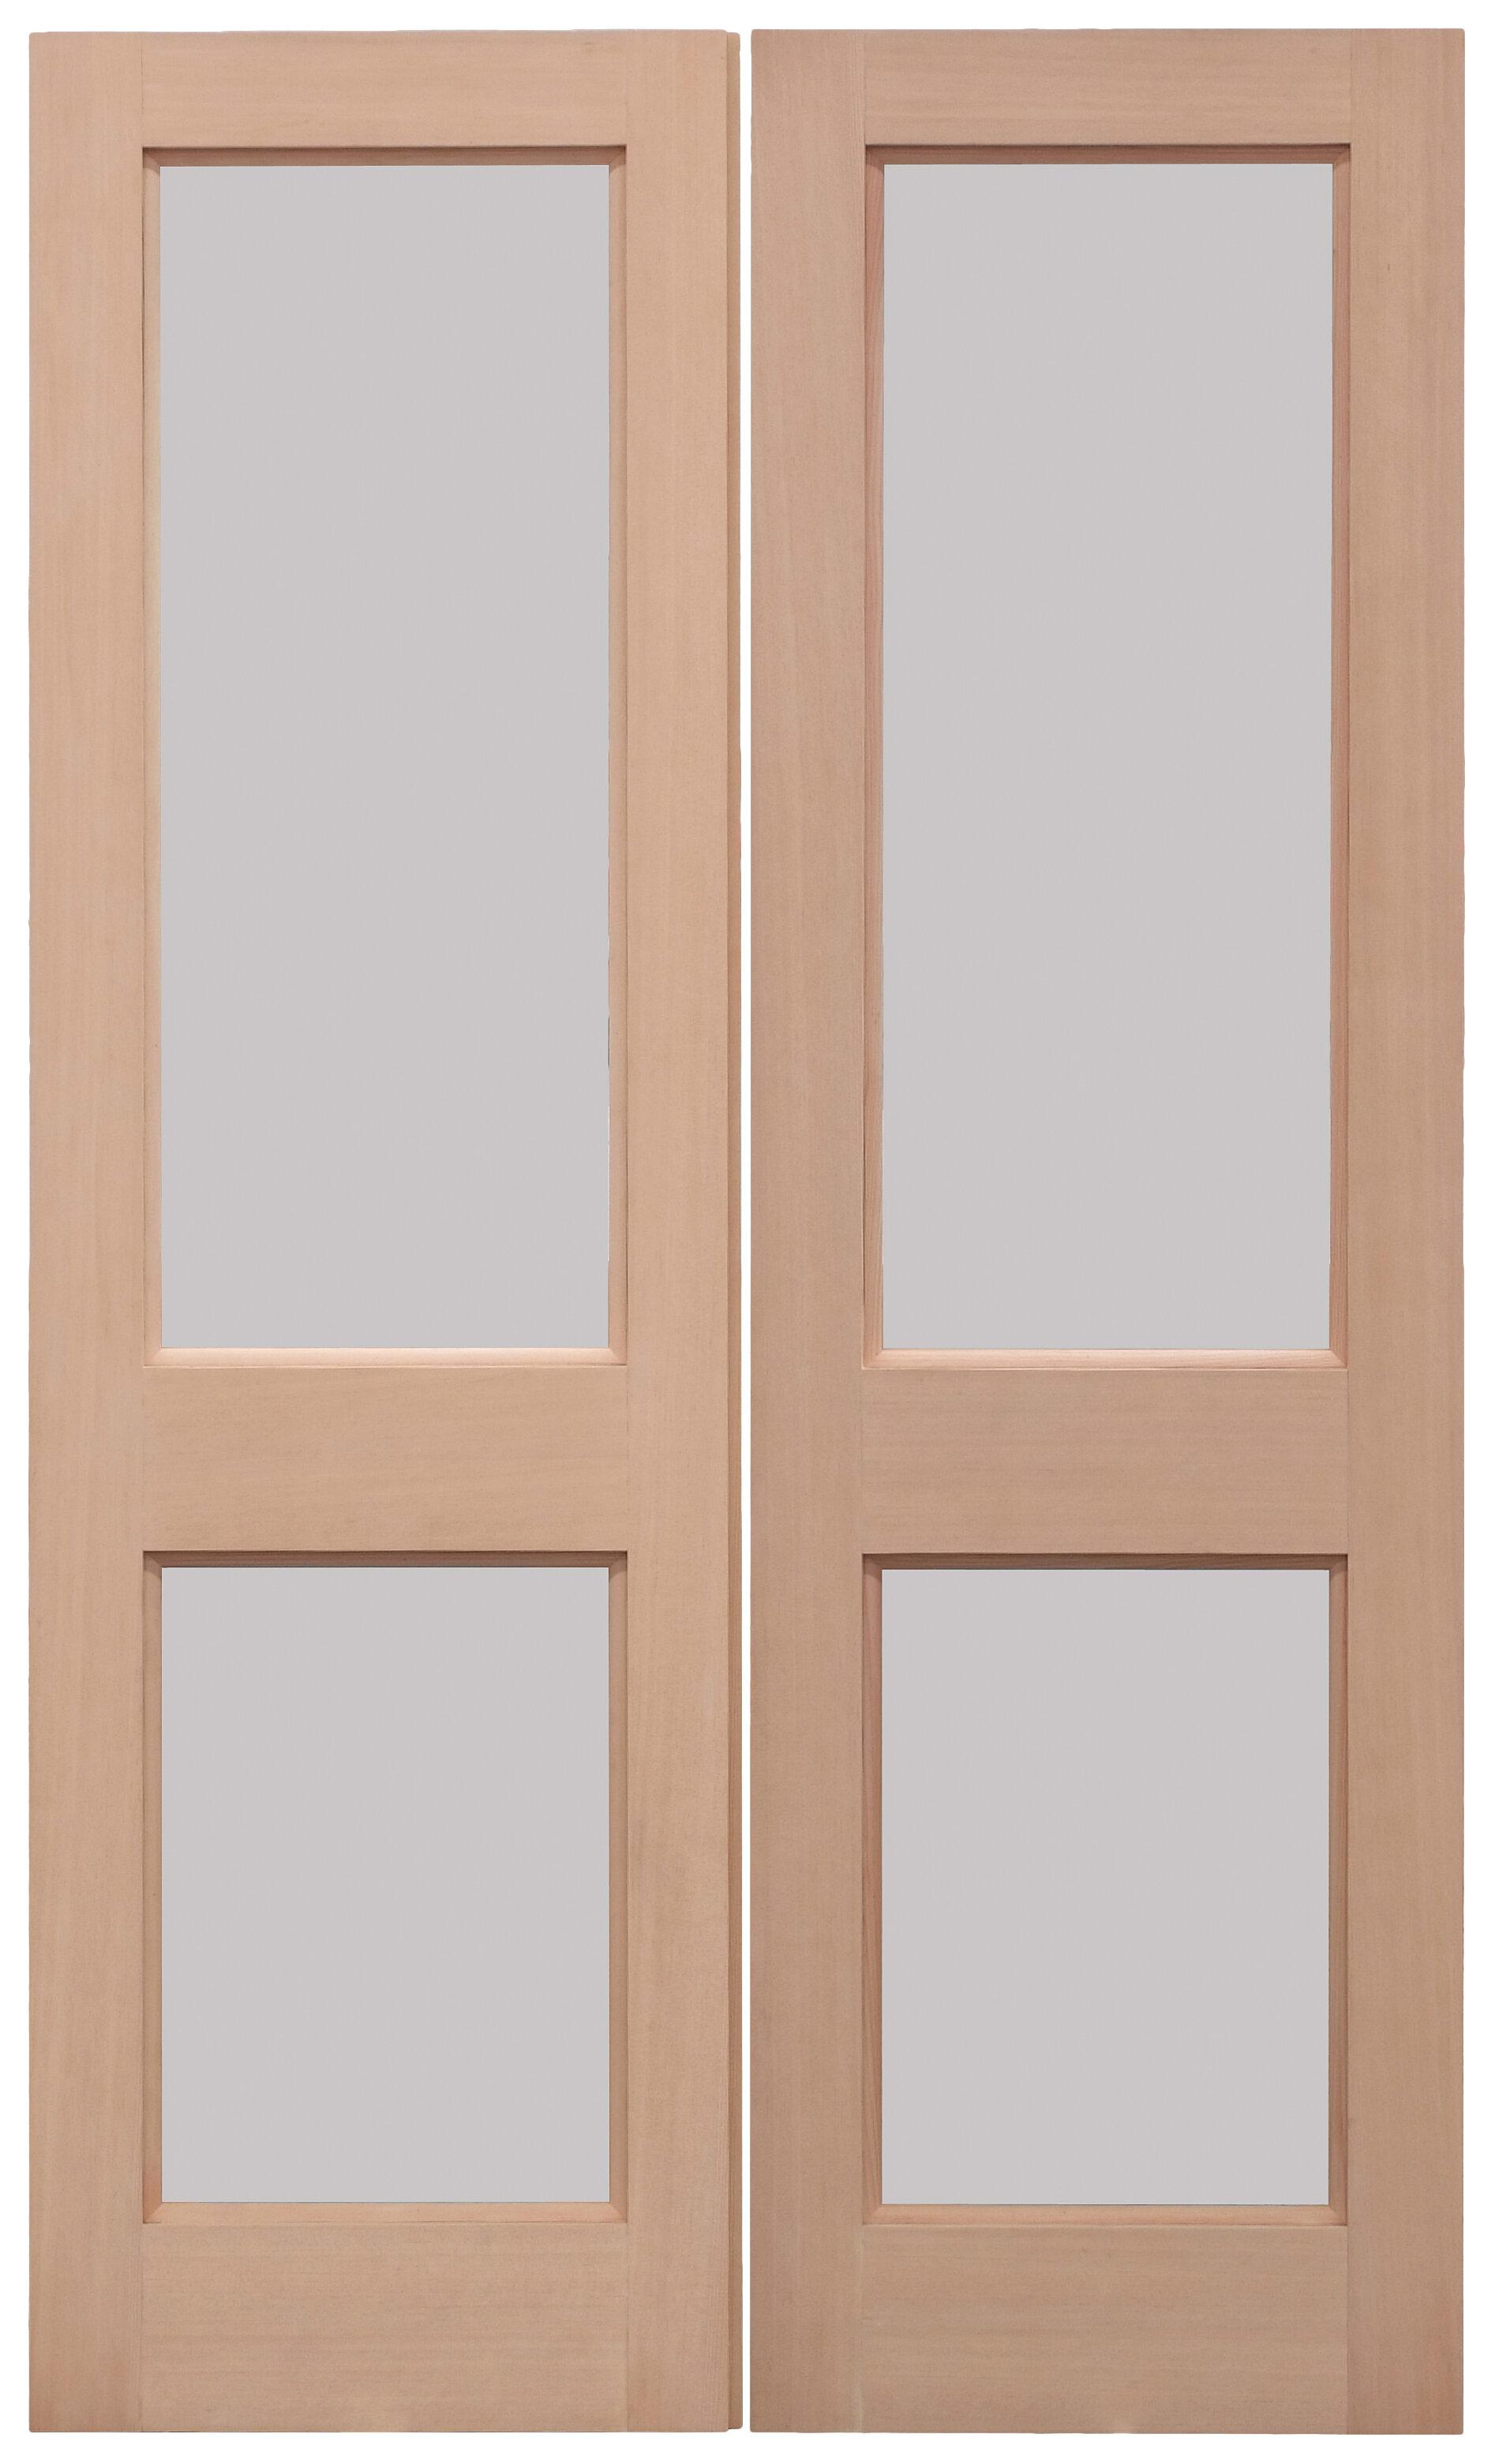 sc 1 st  Wayfair & LPD Doors 2XG Wooden Unglazed External Door \u0026 Reviews | Wayfair.co.uk